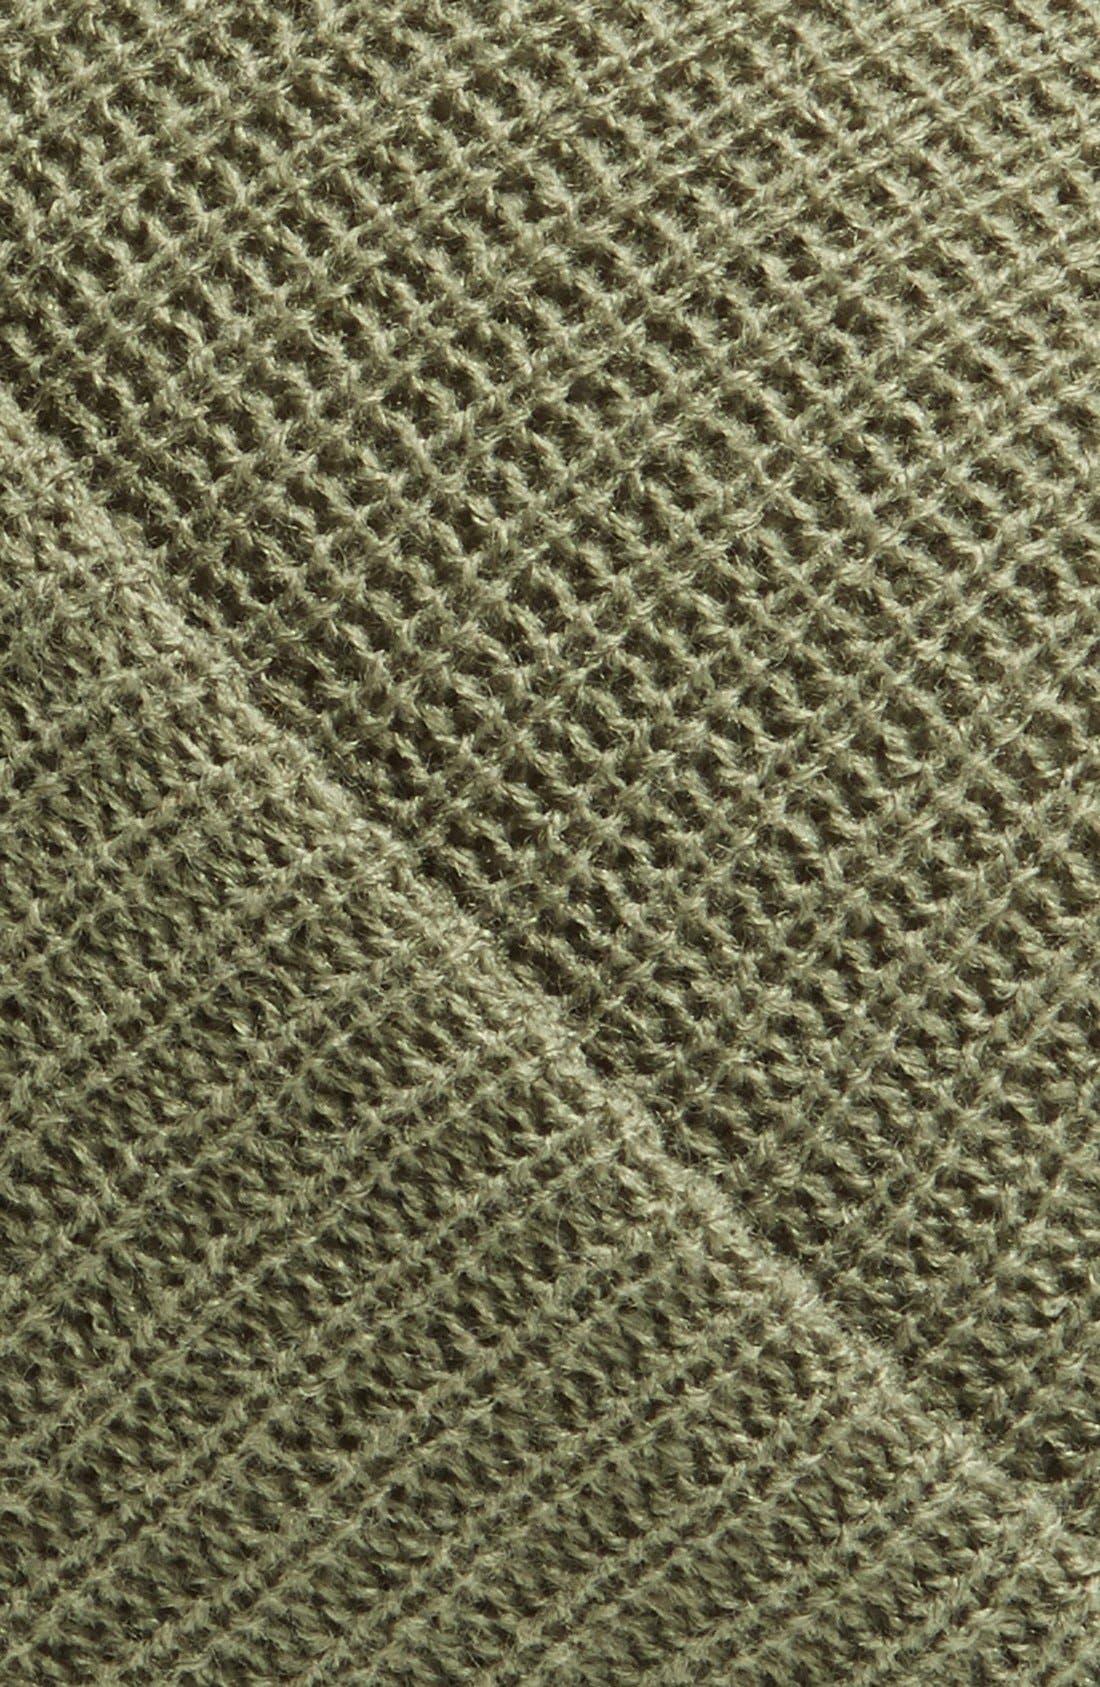 'Quartz' Solid Knit Cap,                             Alternate thumbnail 13, color,